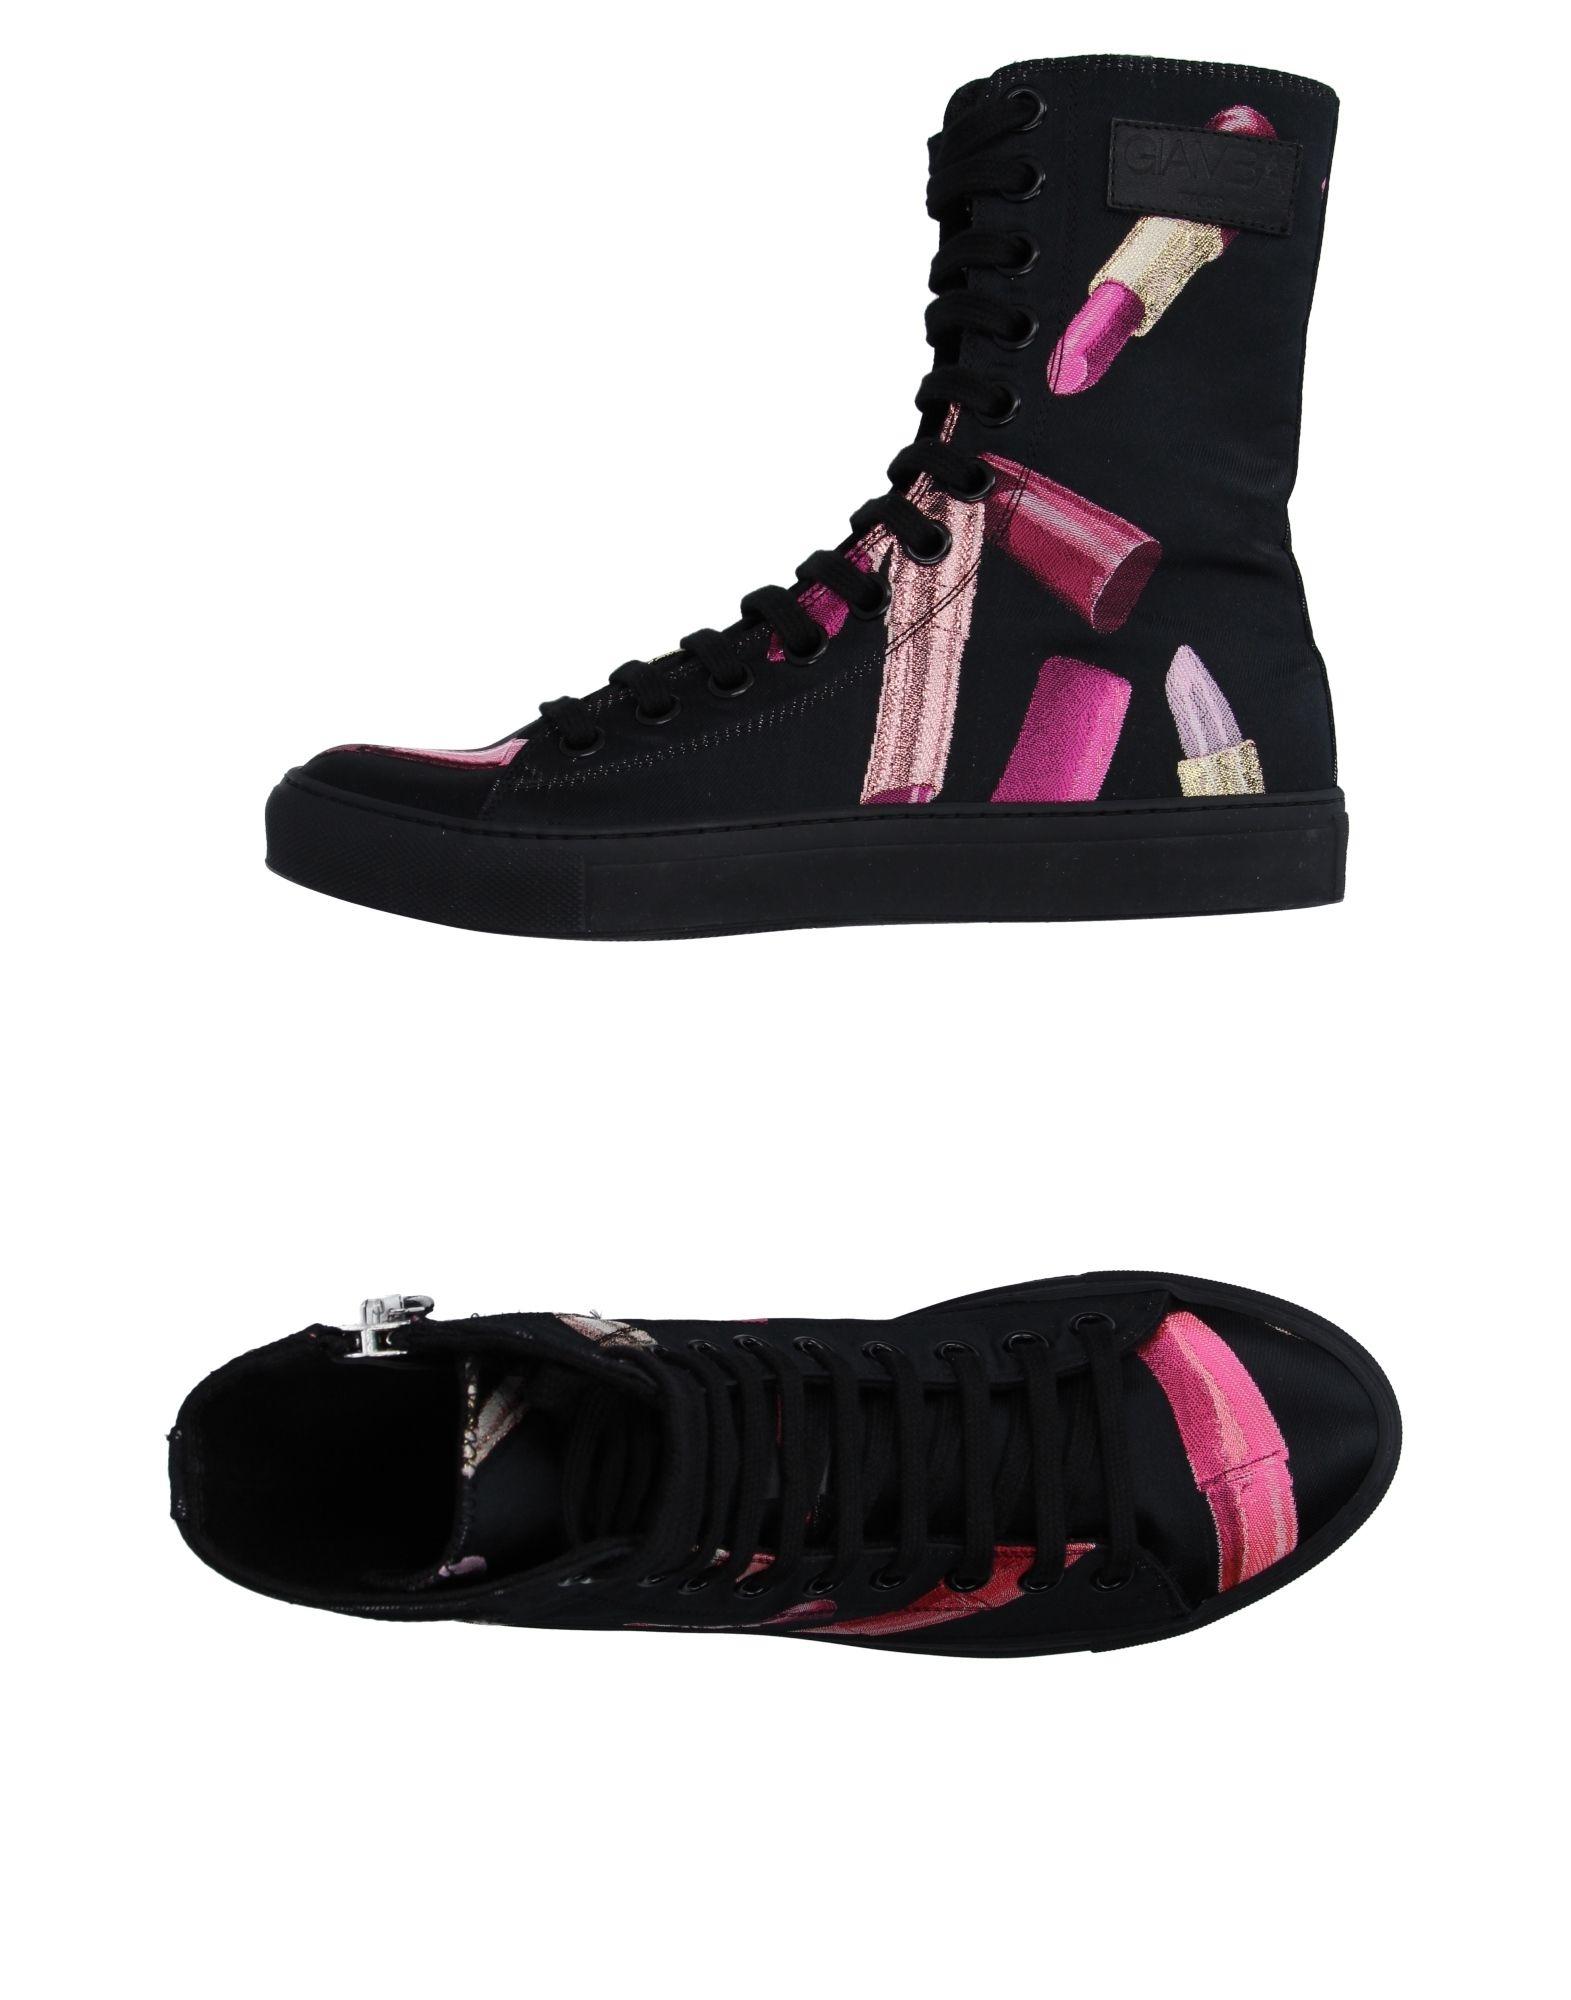 GIAMBA Высокие кеды и кроссовки кеды кроссовки высокие dc council mid tx stone camo